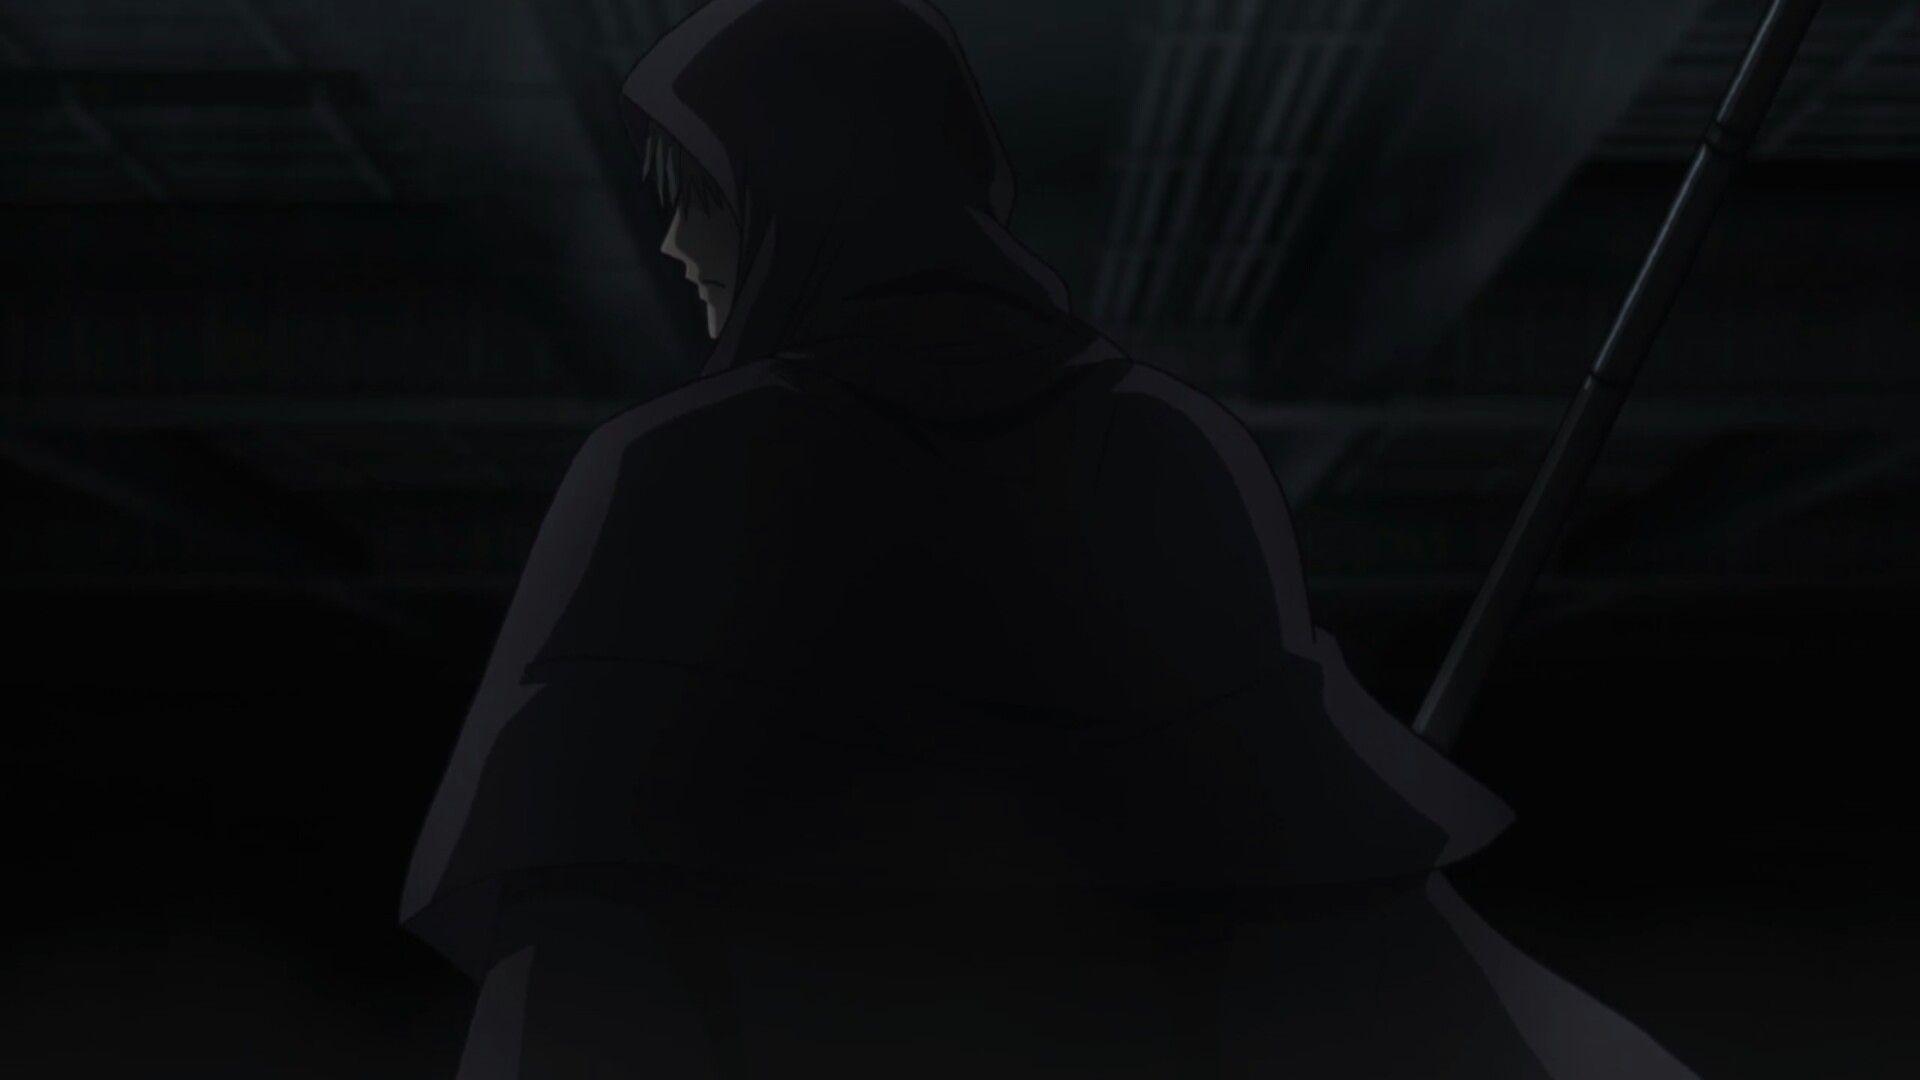 Amon Episode 9 Tokyo Ghoul Re Tokyo Ghoul Ghoul Tokyo